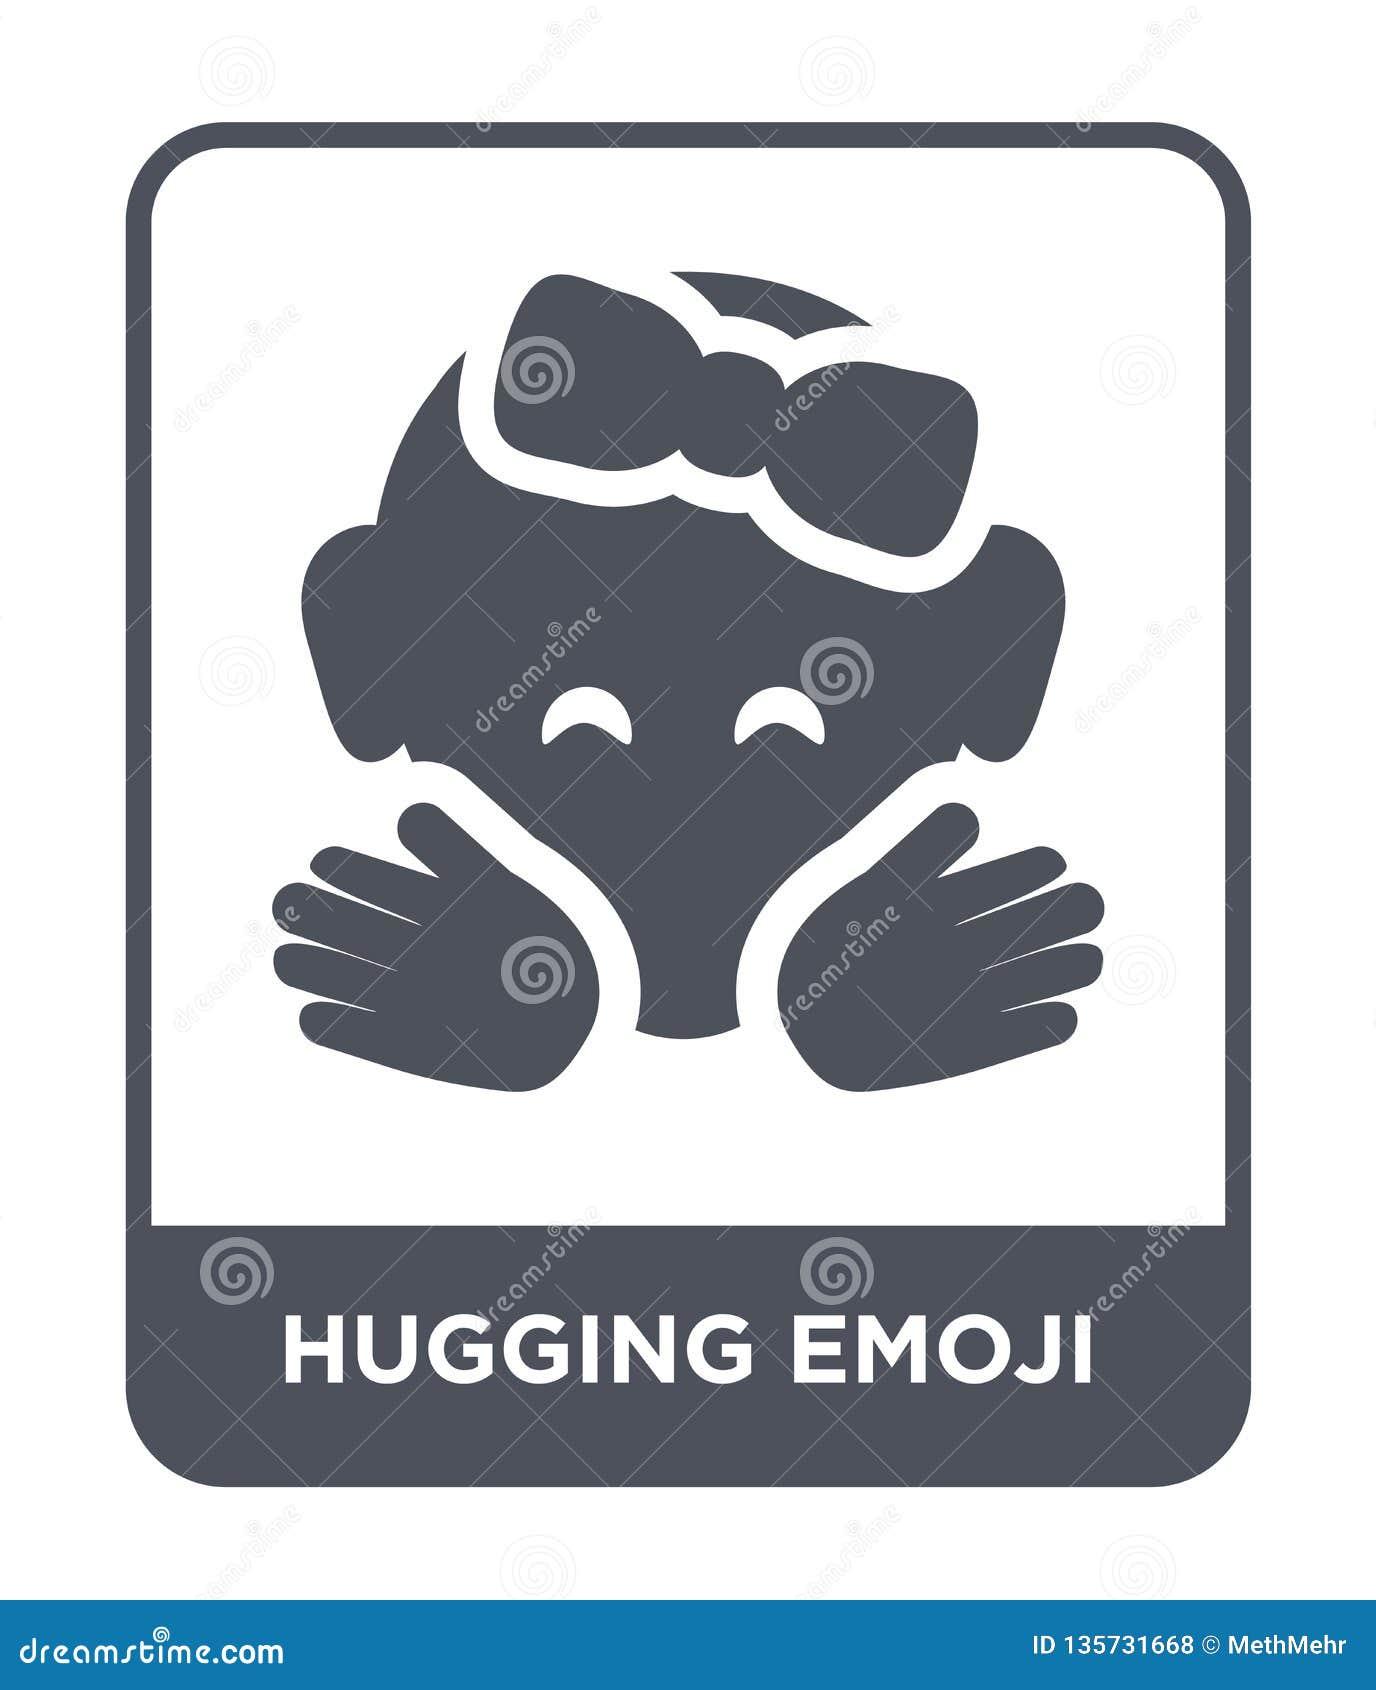 Hugging Emoji Icon In Trendy Design Style  Hugging Emoji